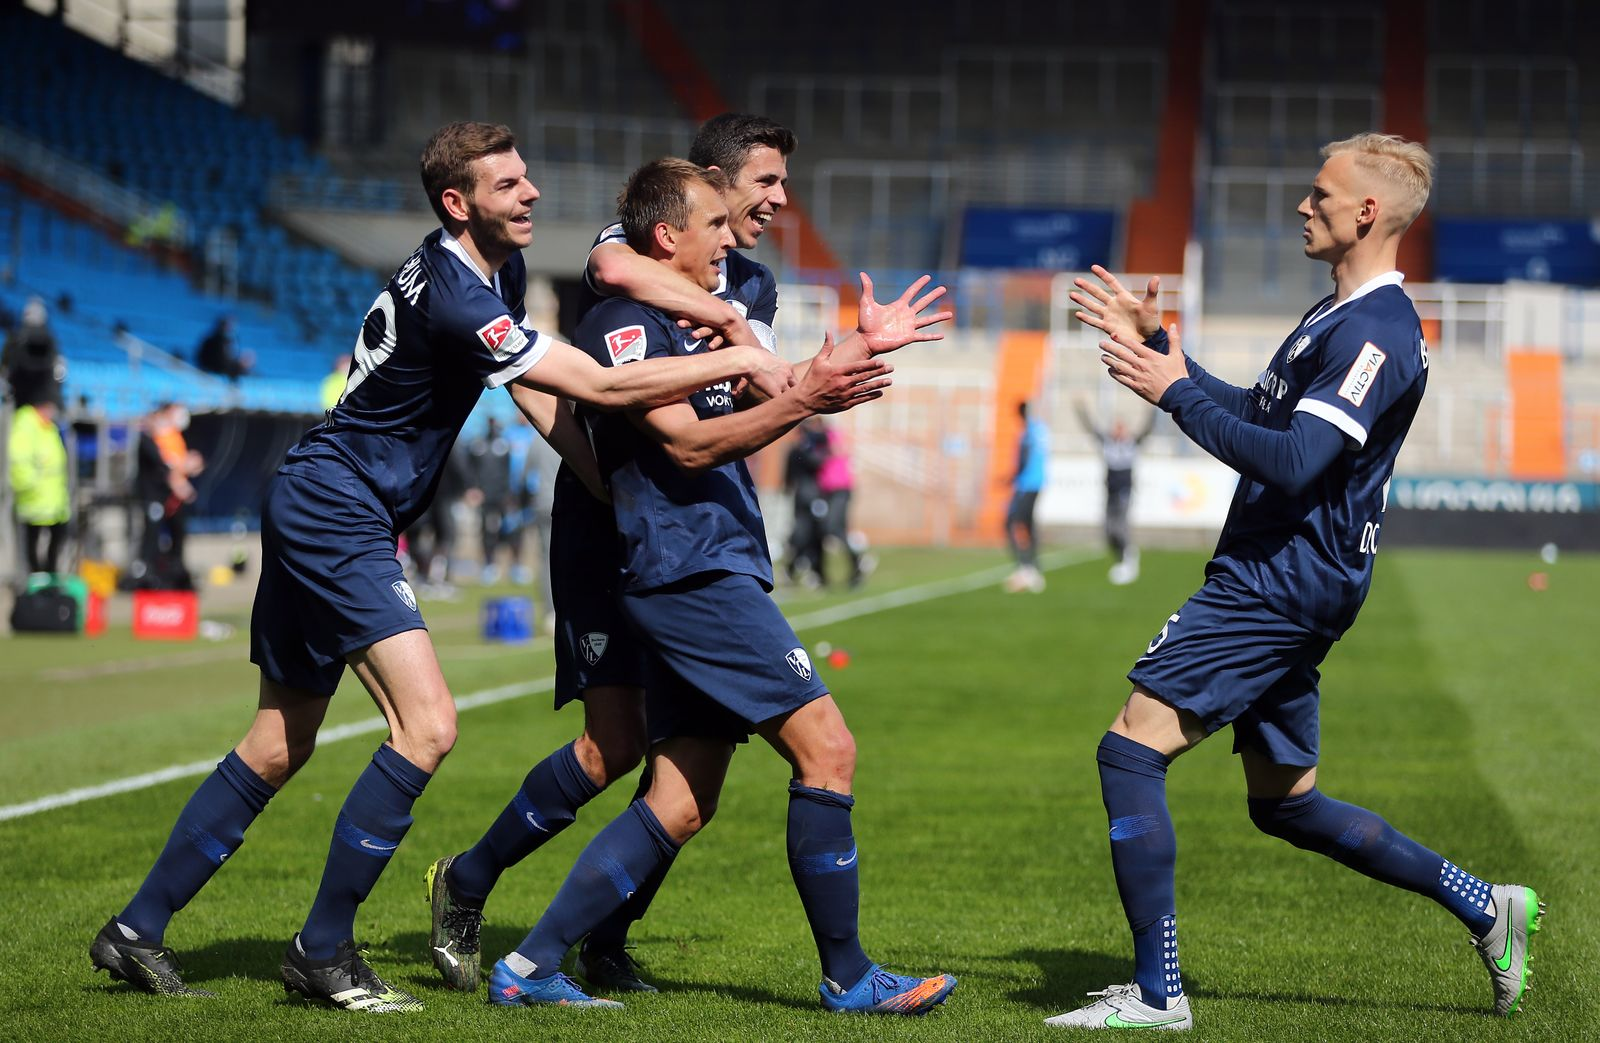 VfL Bochum 1848 v Hannover 96 - Second Bundesliga